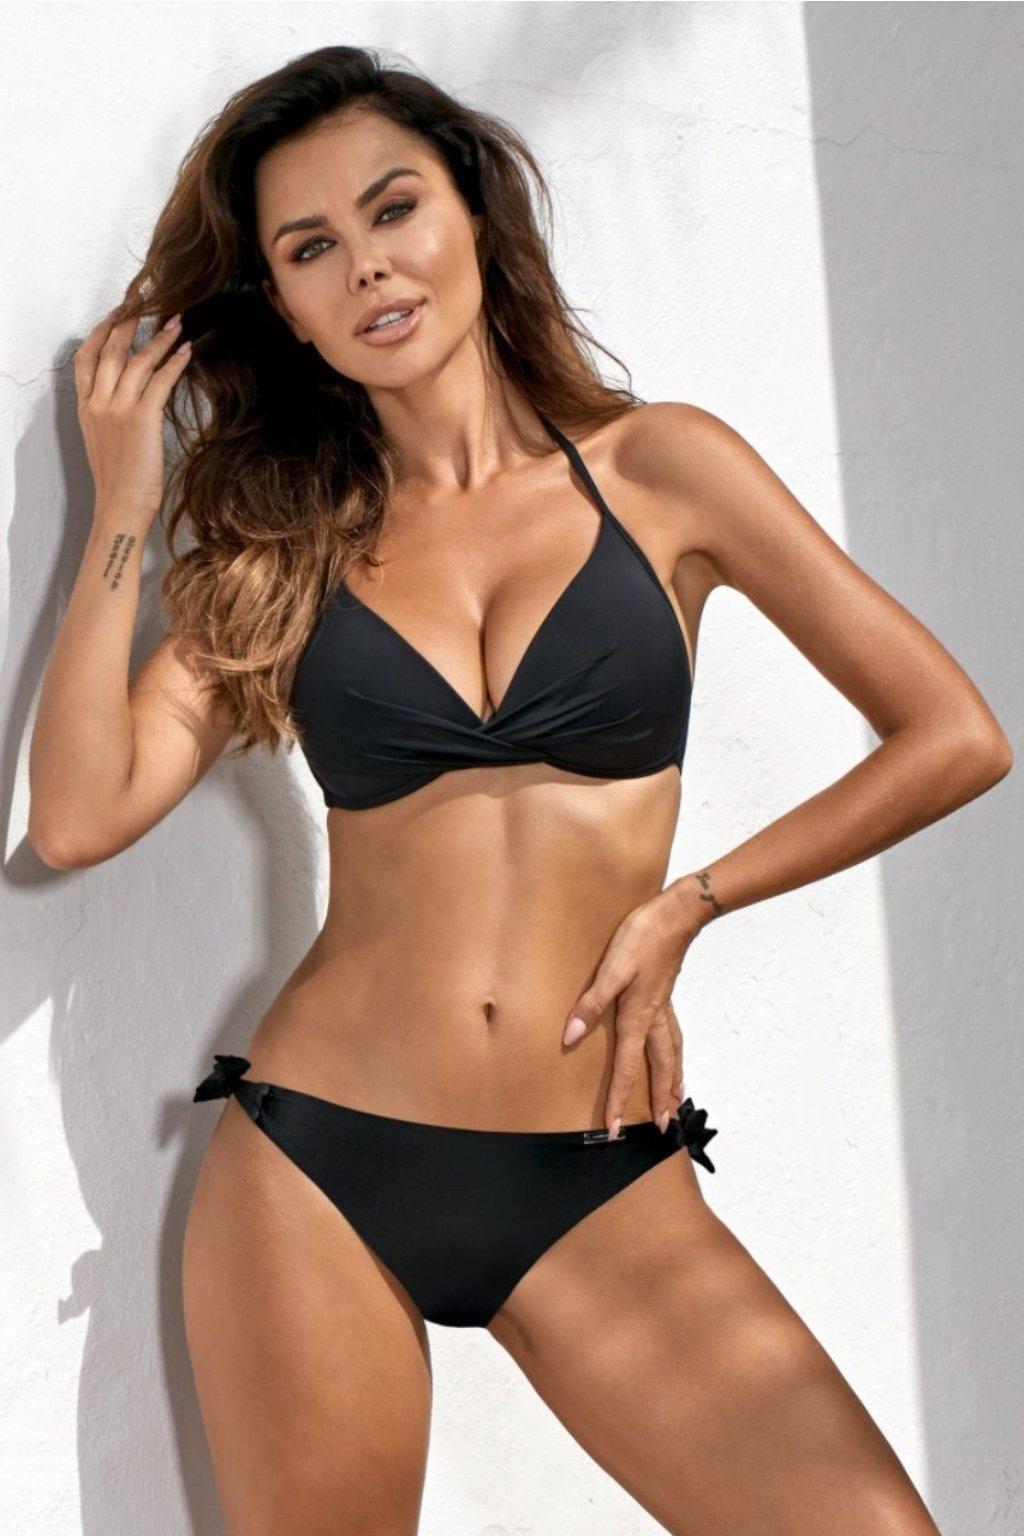 Dámské plavky Gabbiano Anabel G 01 Black